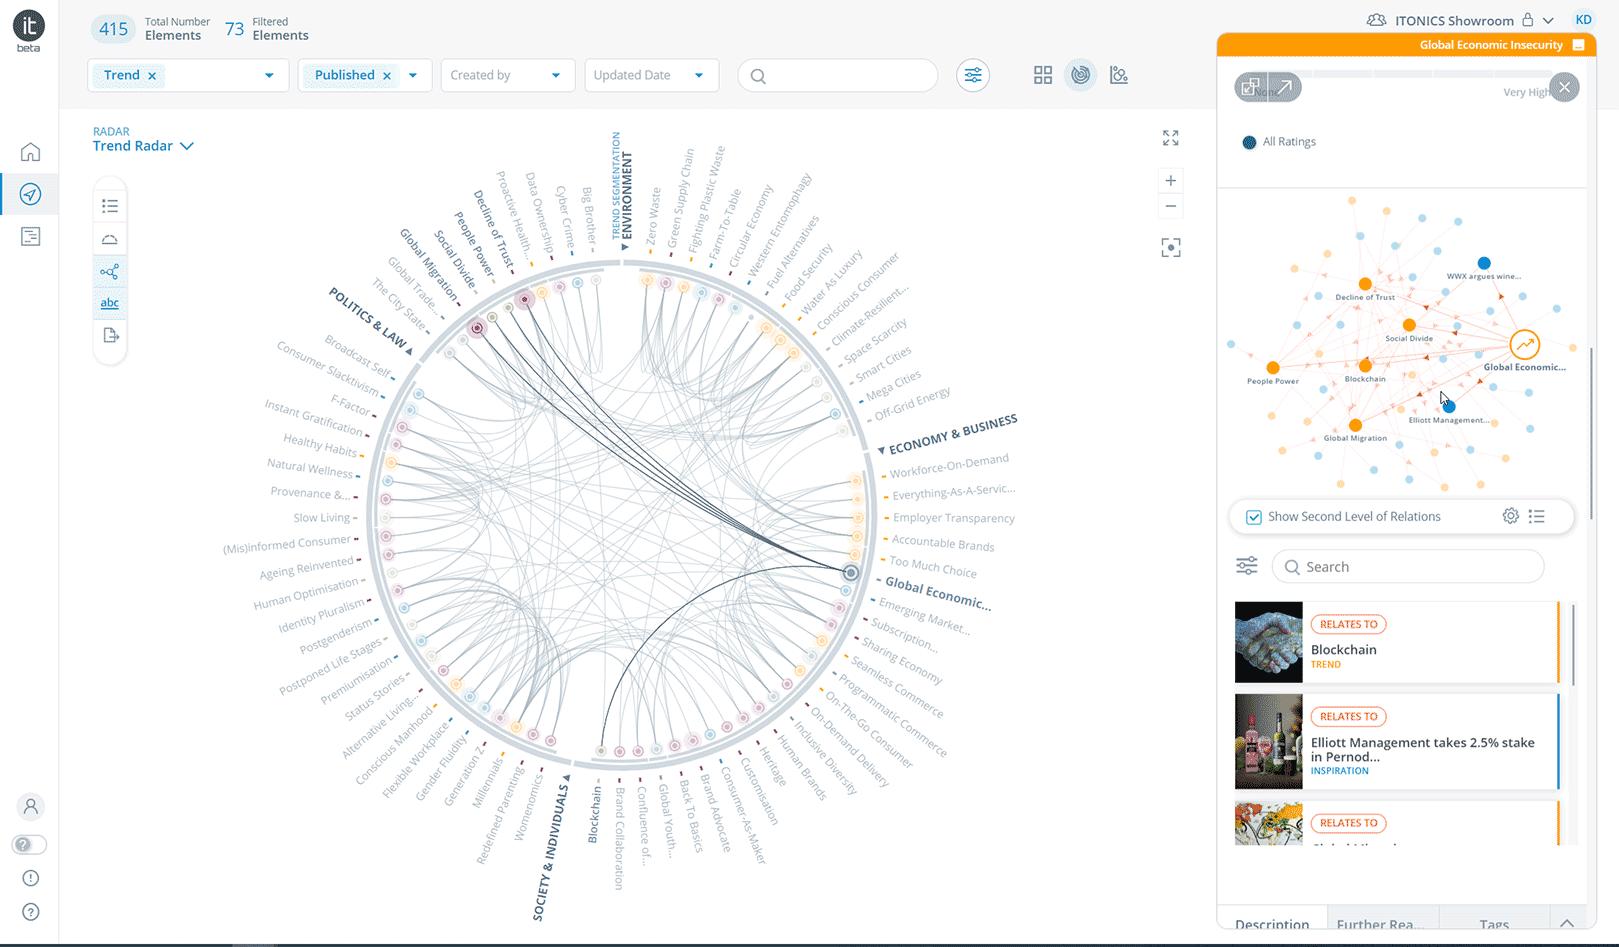 Kollaborative Trendradar Software - Jetzt Demo testen!